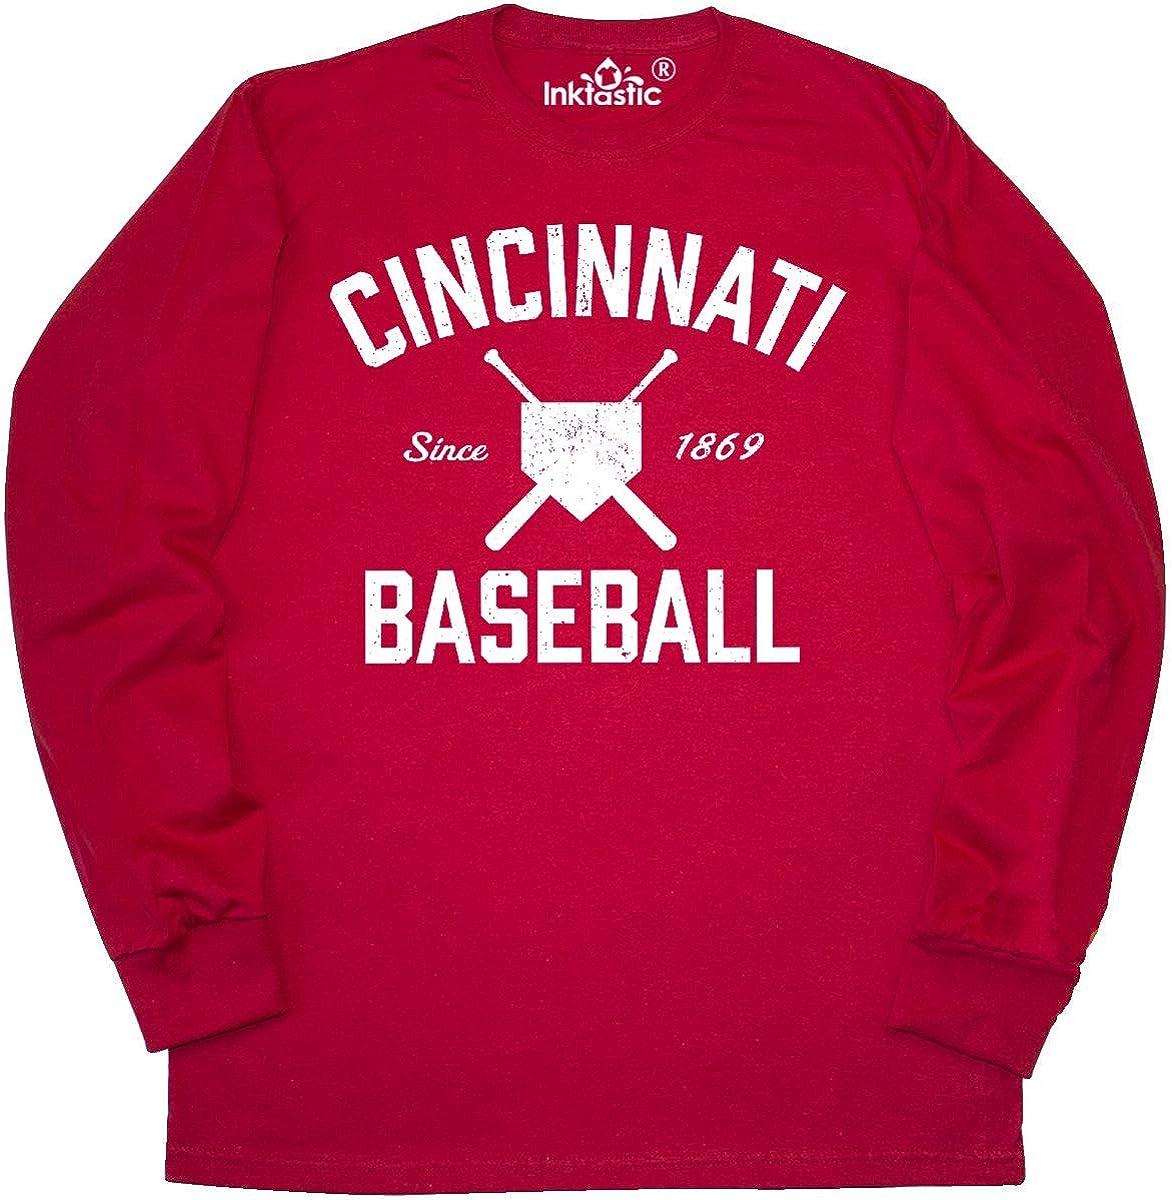 Sm-5X Nalie Sports Cincinnati Baseball Fans Charlie Hustle Red T-Shirt